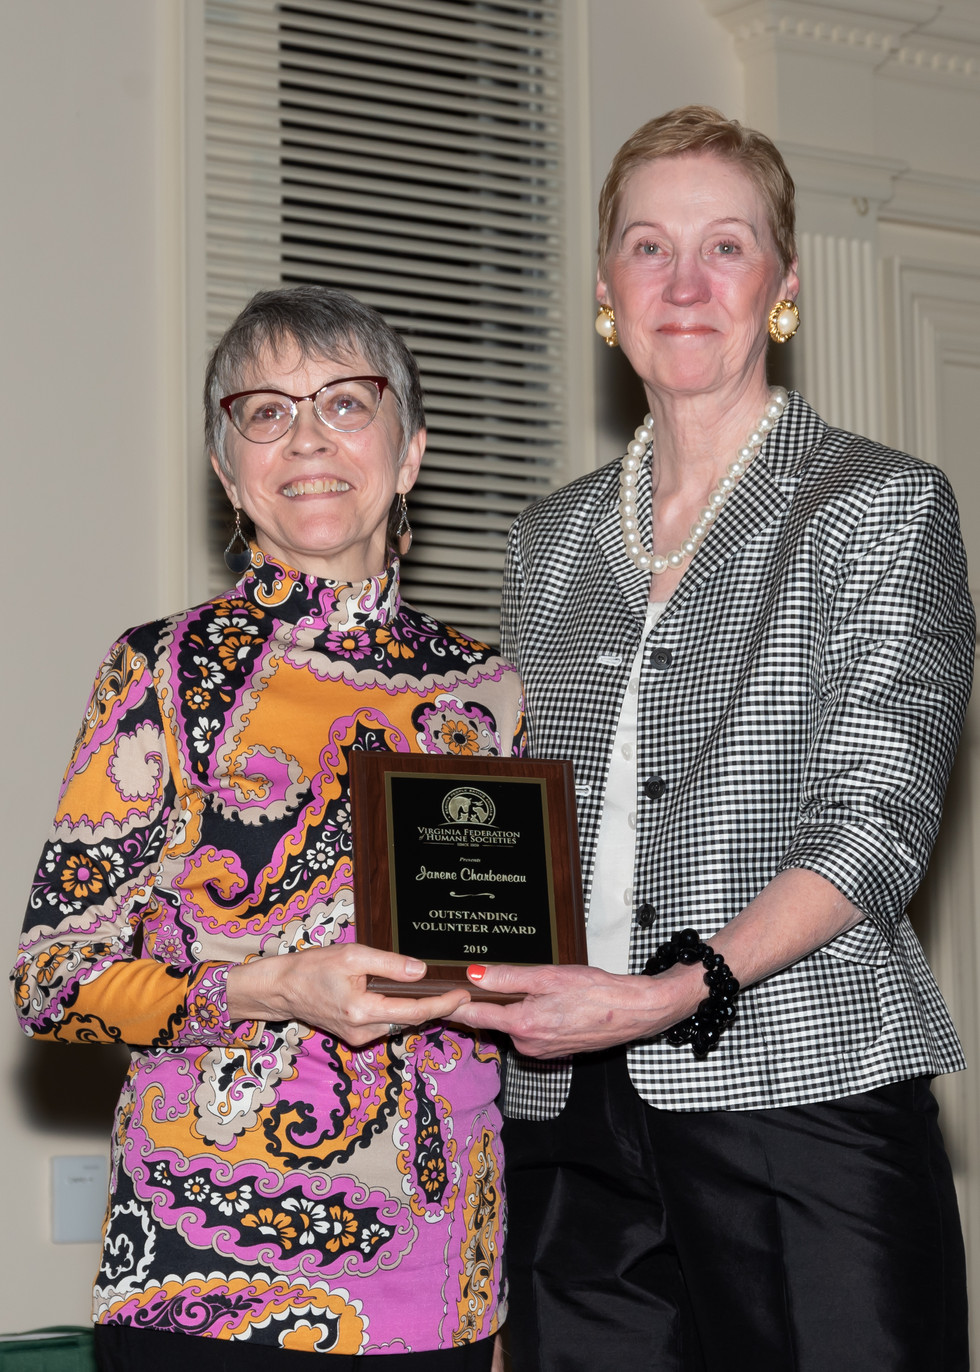 2019 VFHS Outstanding Volunteer Award